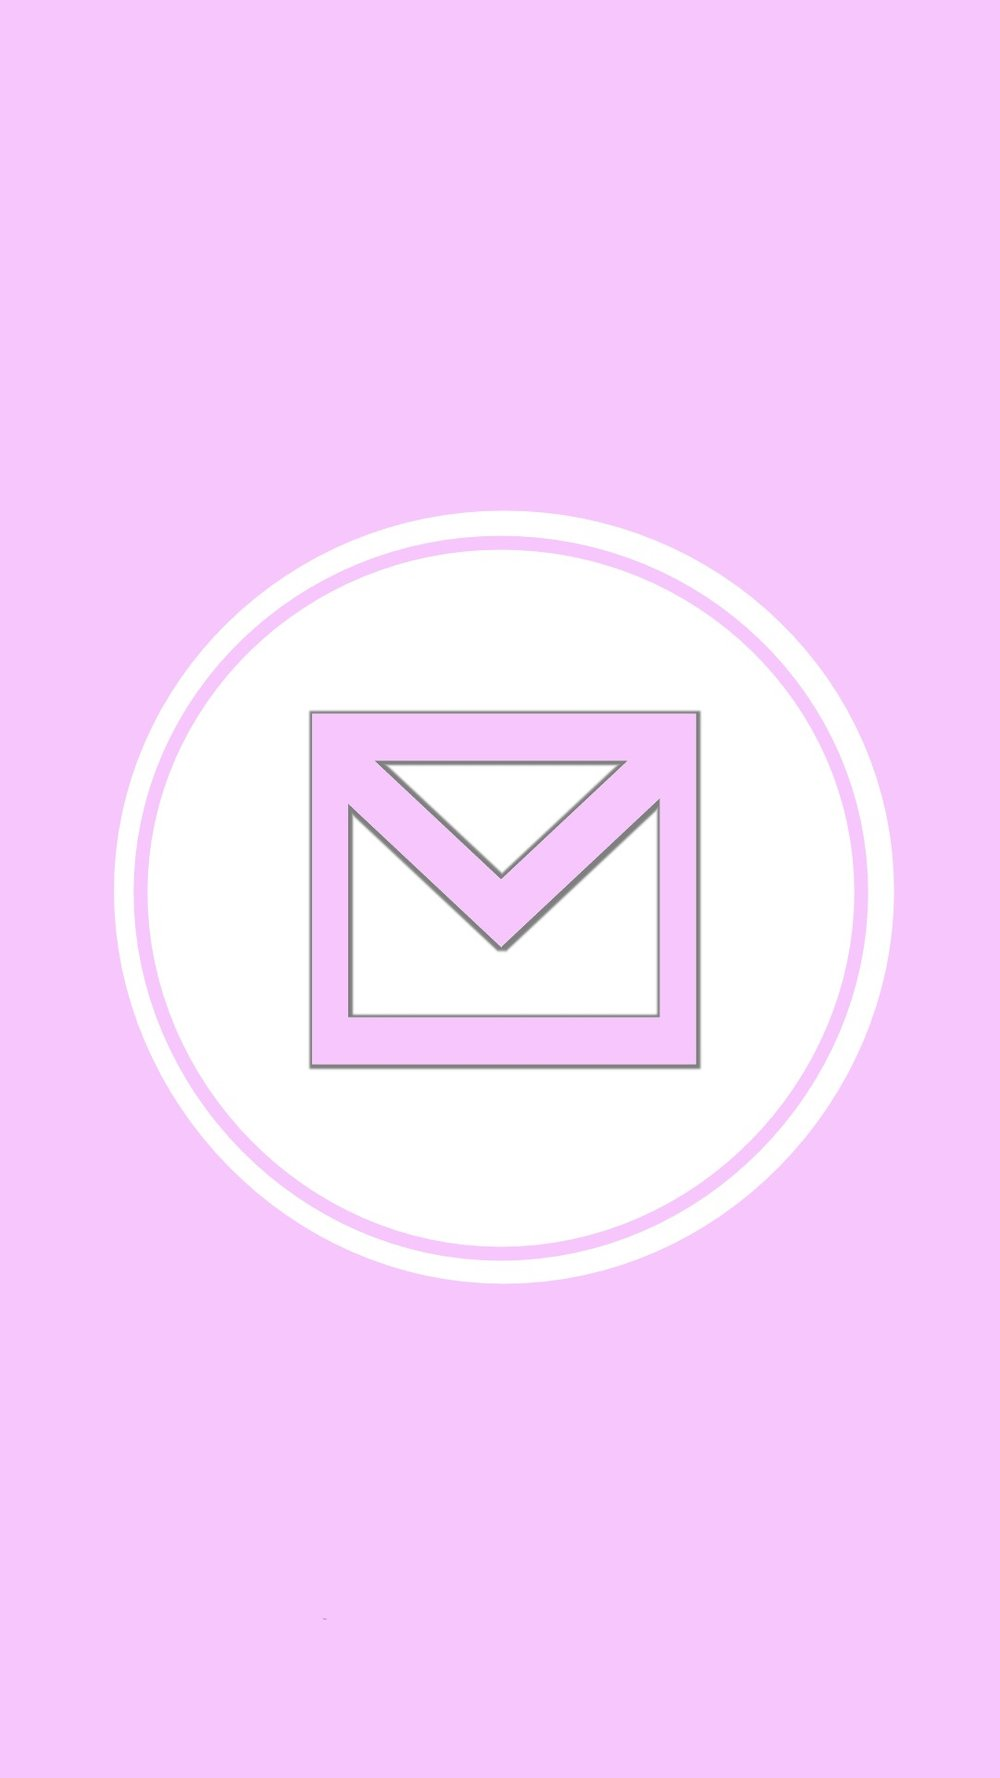 Instagram-cover-envelope-pink-lotnotes.com.jpg